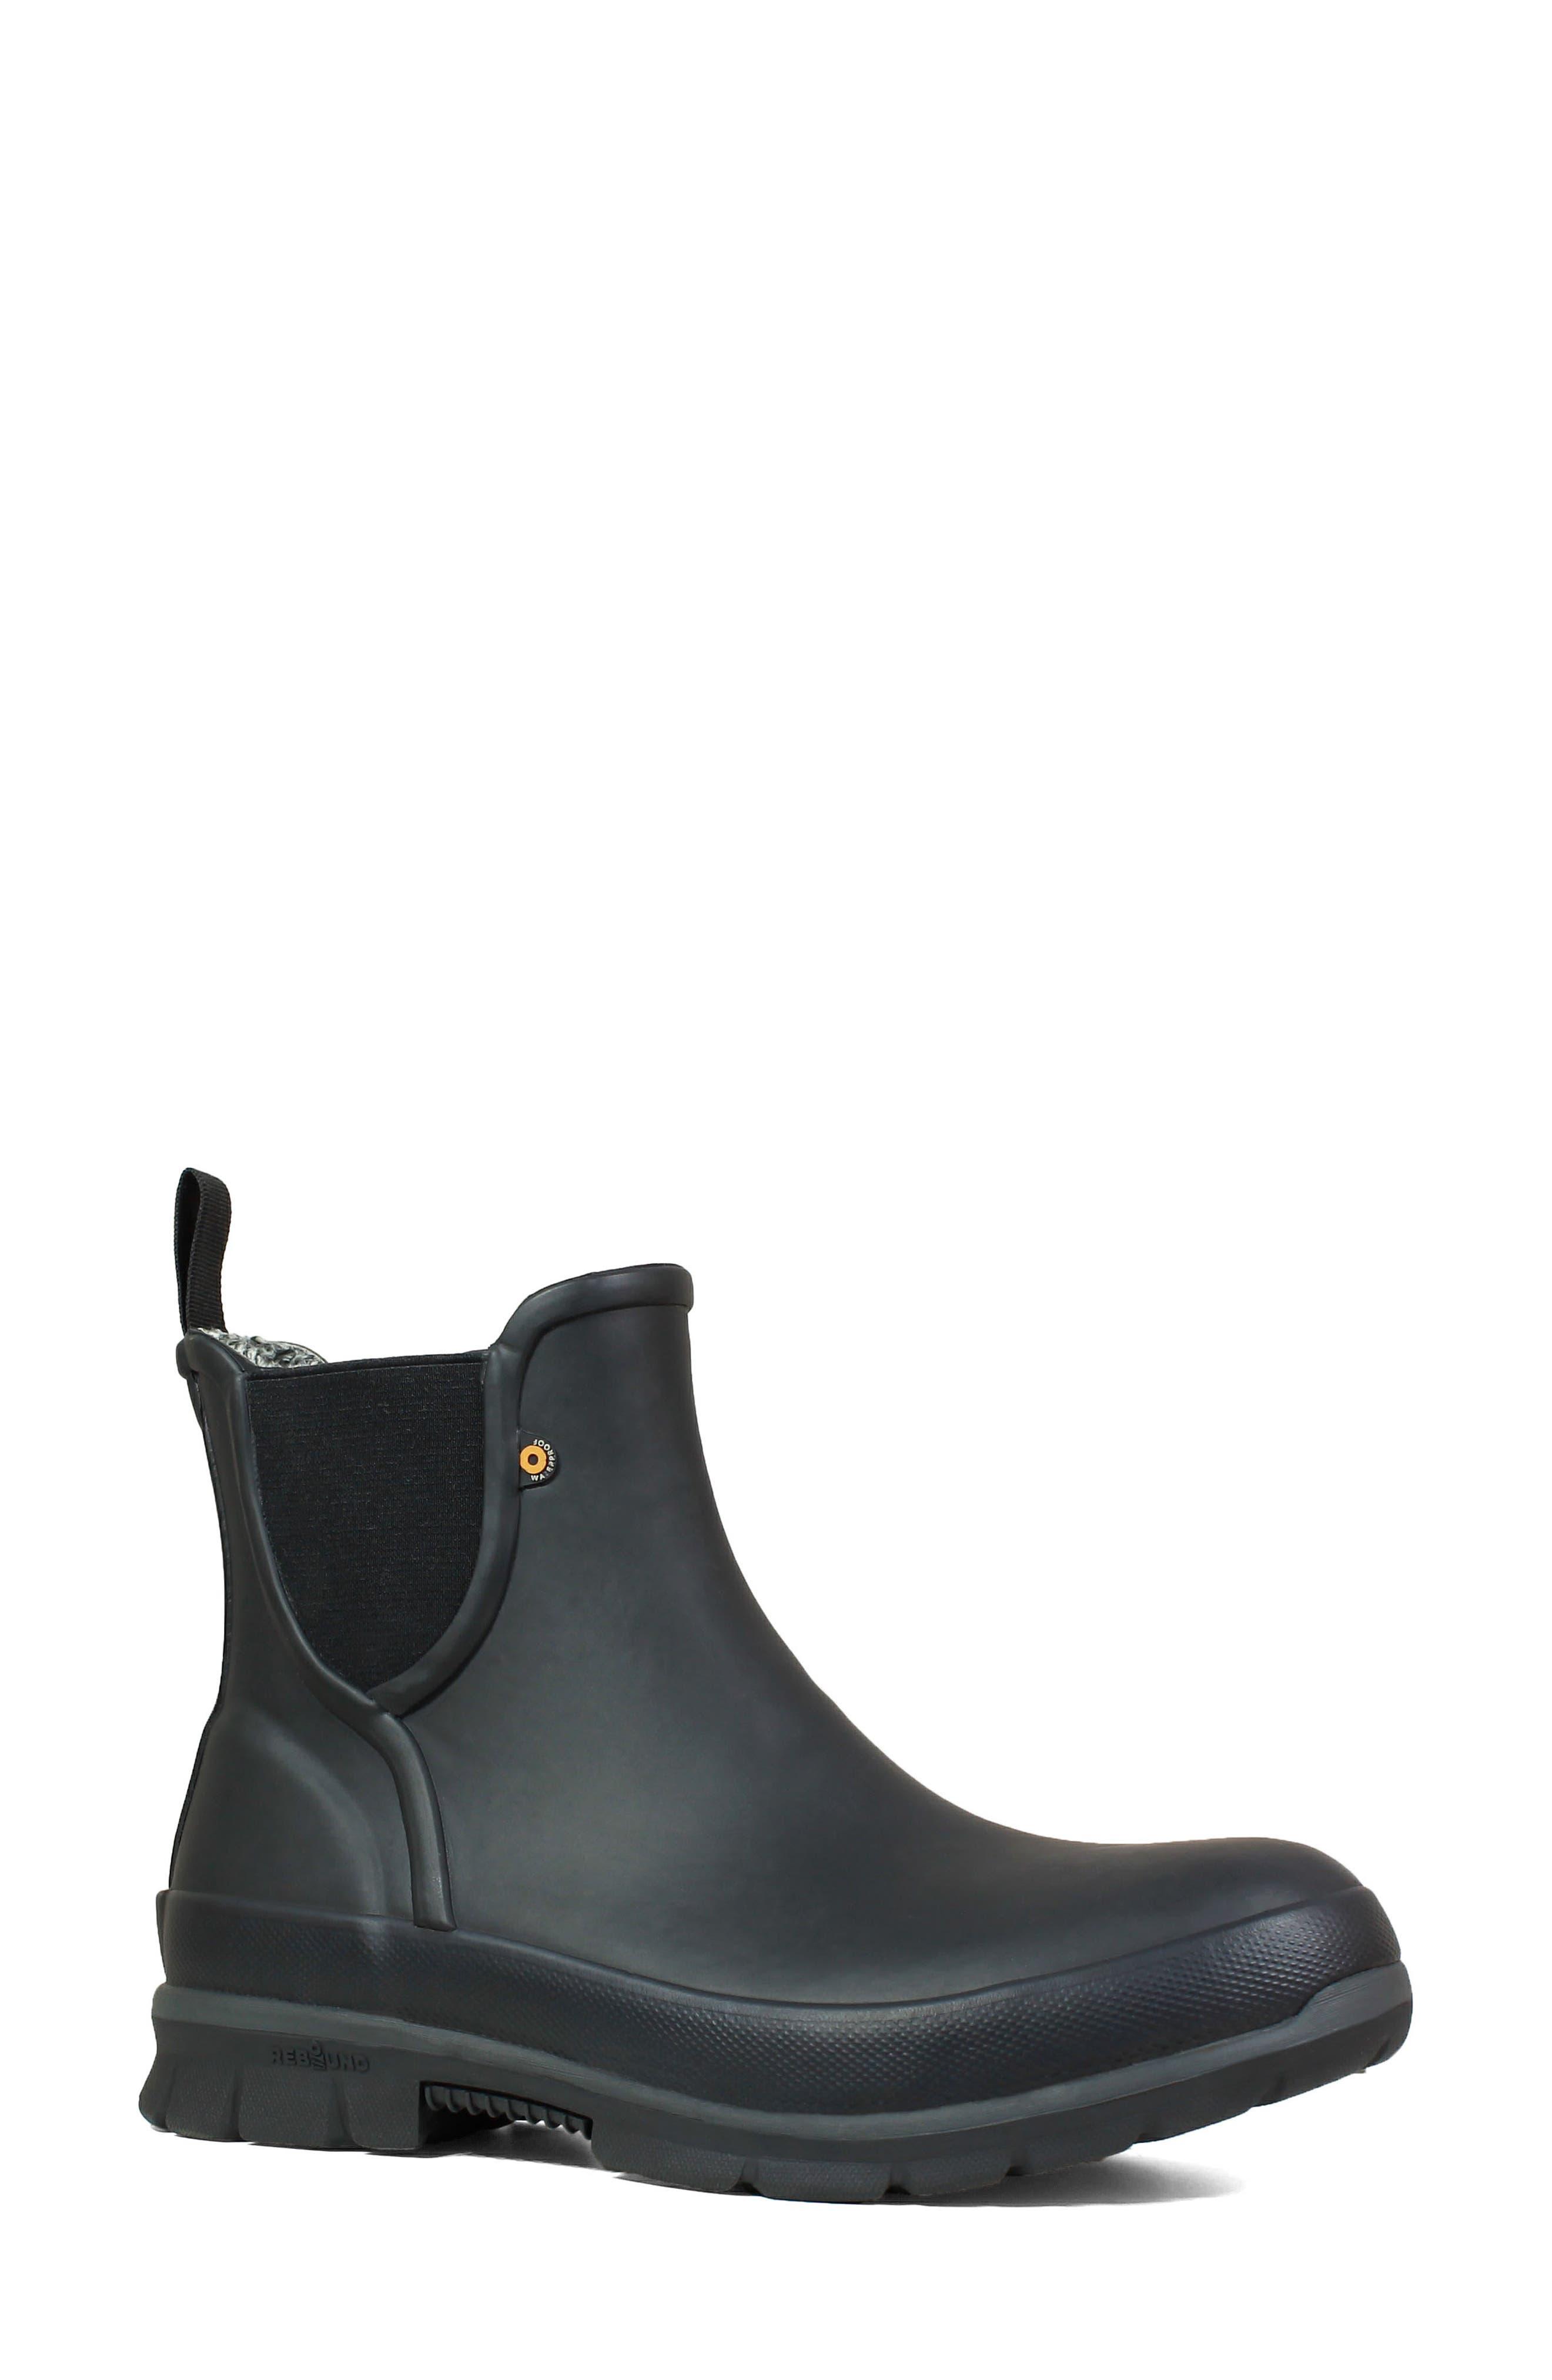 Bogs Amanda Plush Waterproof Slip-On Boot, Black